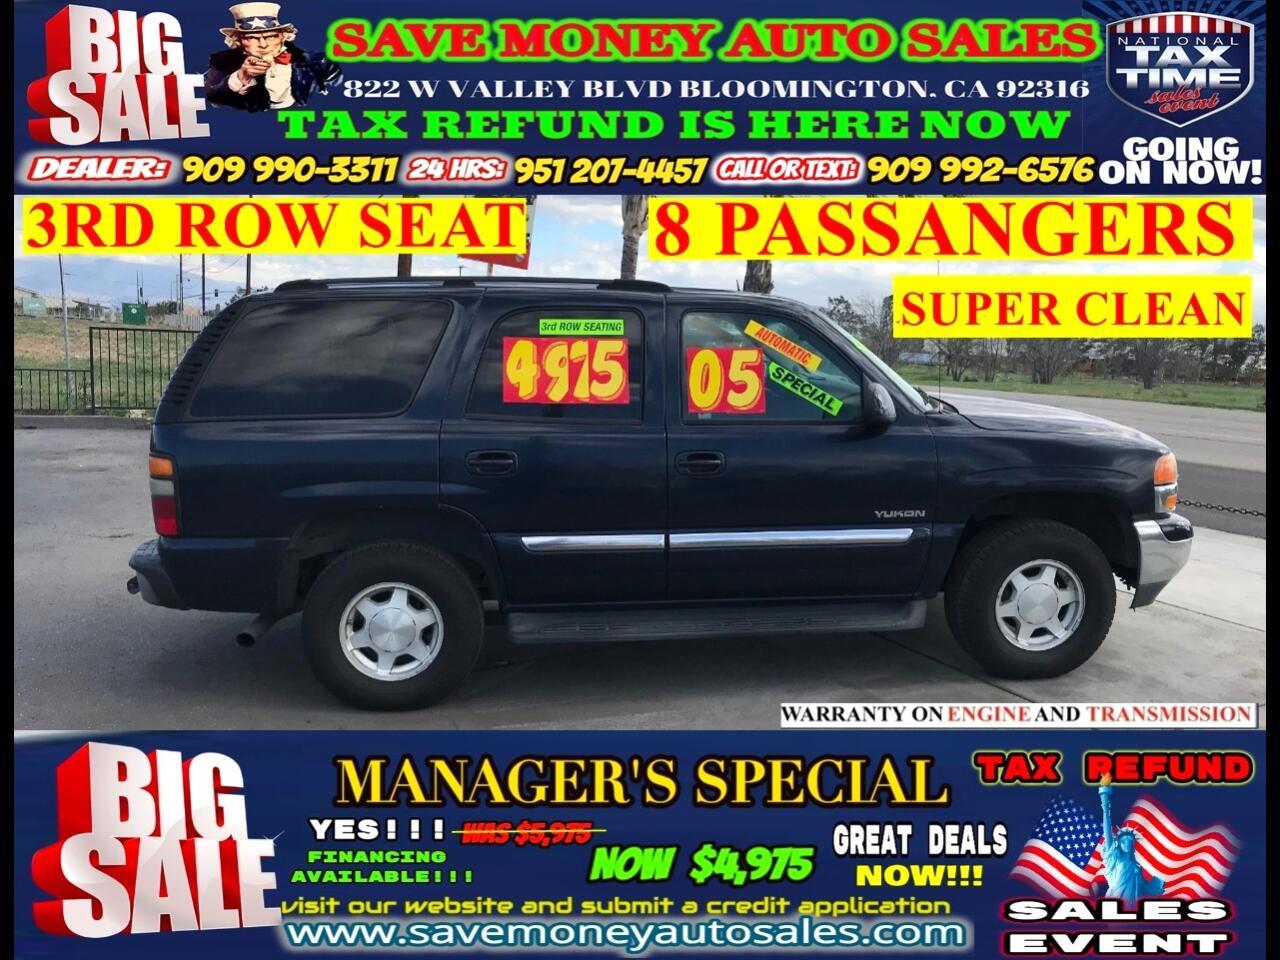 2005 GMC Yukon 2WD > 3RD ROW SEAT > 8 PASSANGER > NEW YEAR SPECIA